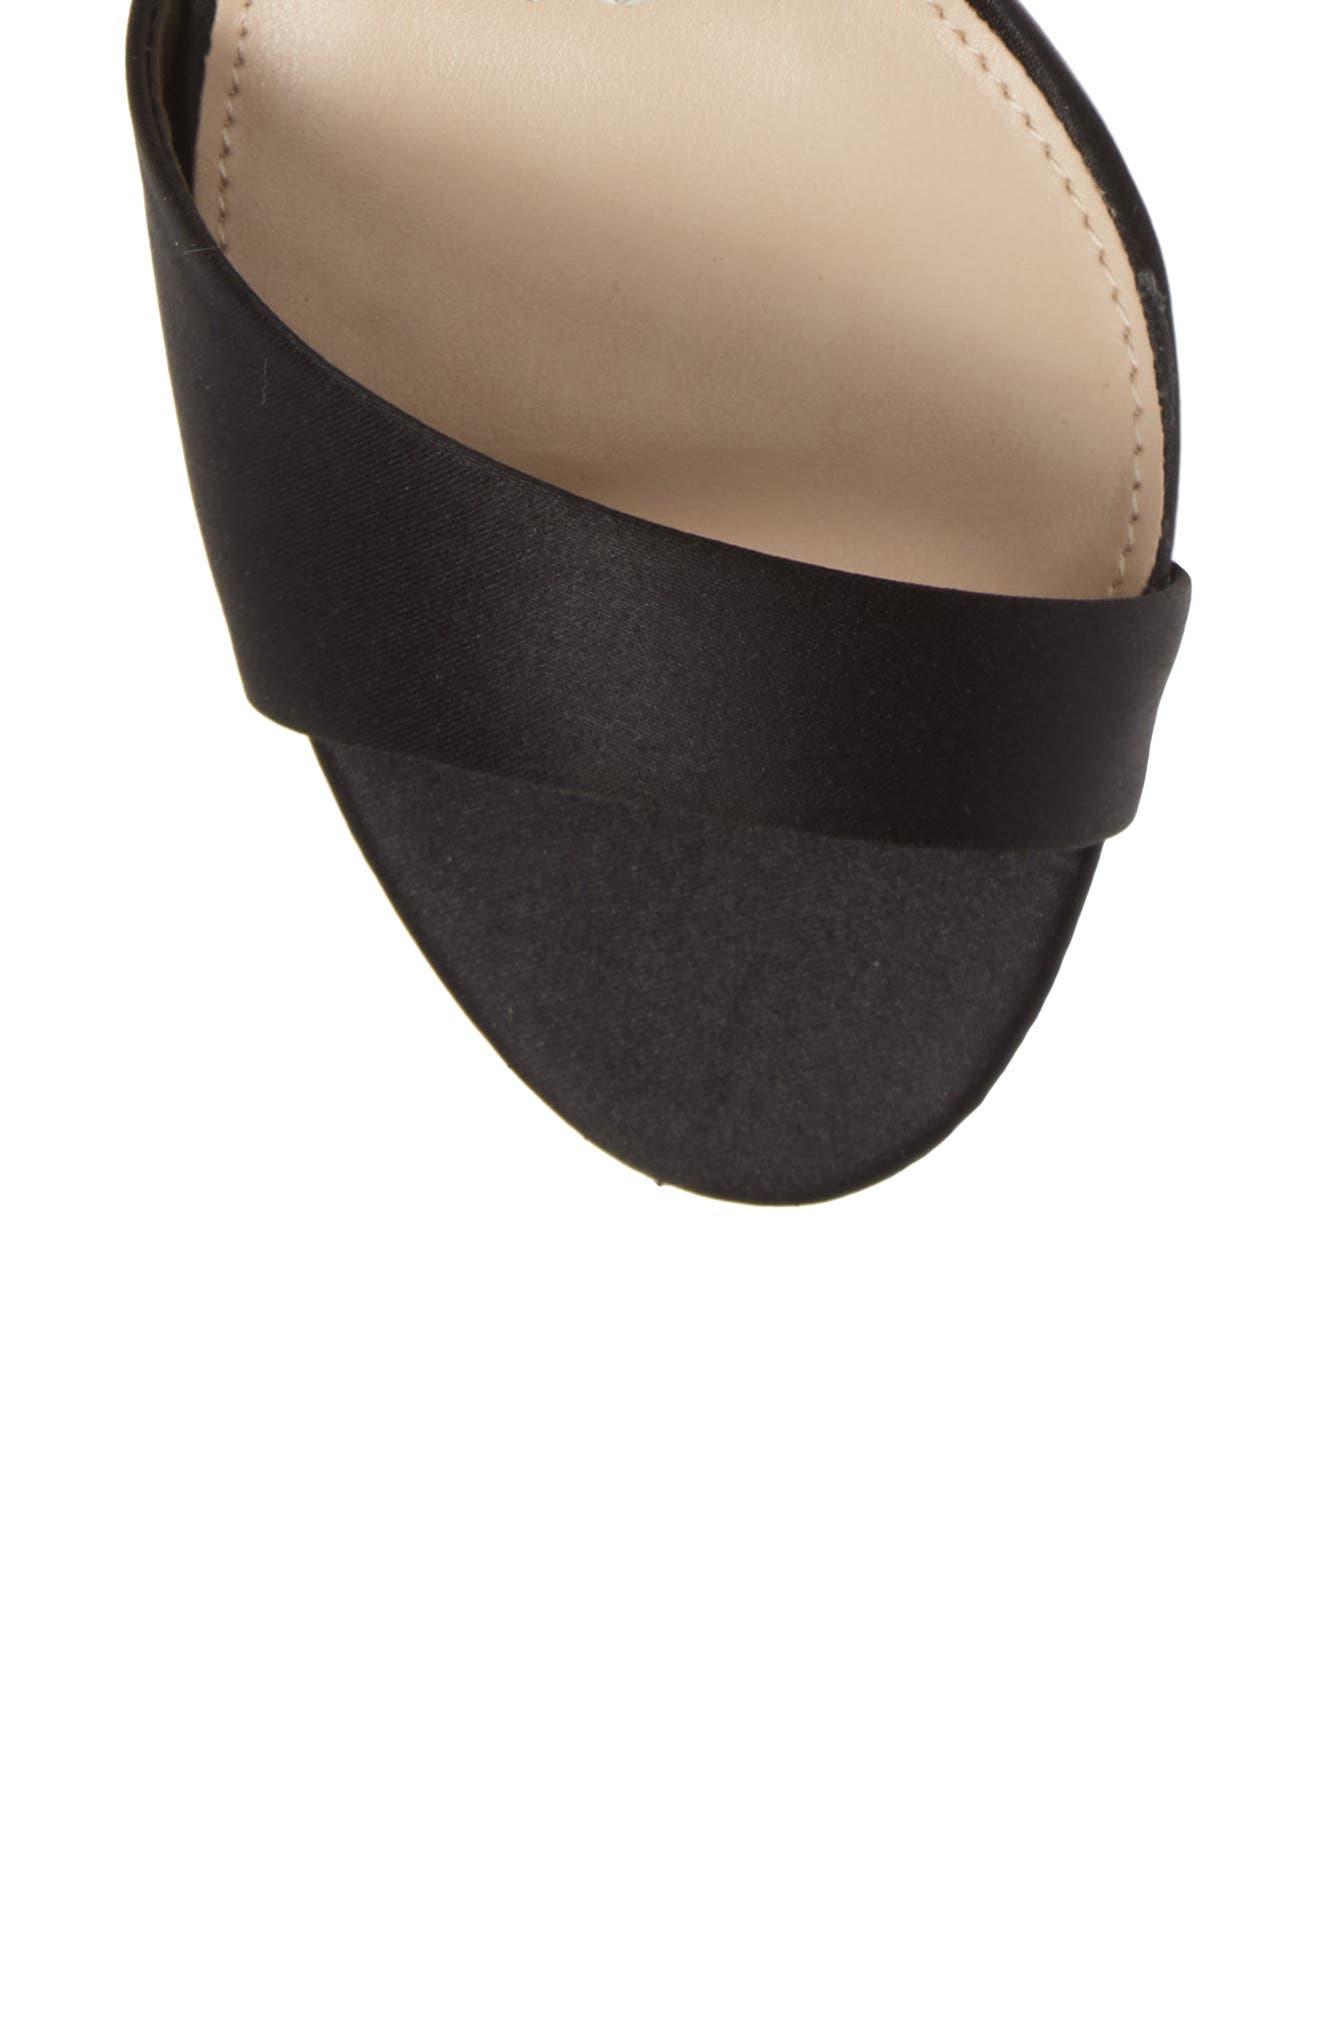 NINA, Vera Embellished Ankle Strap Sandal, Alternate thumbnail 5, color, BLACK SATIN